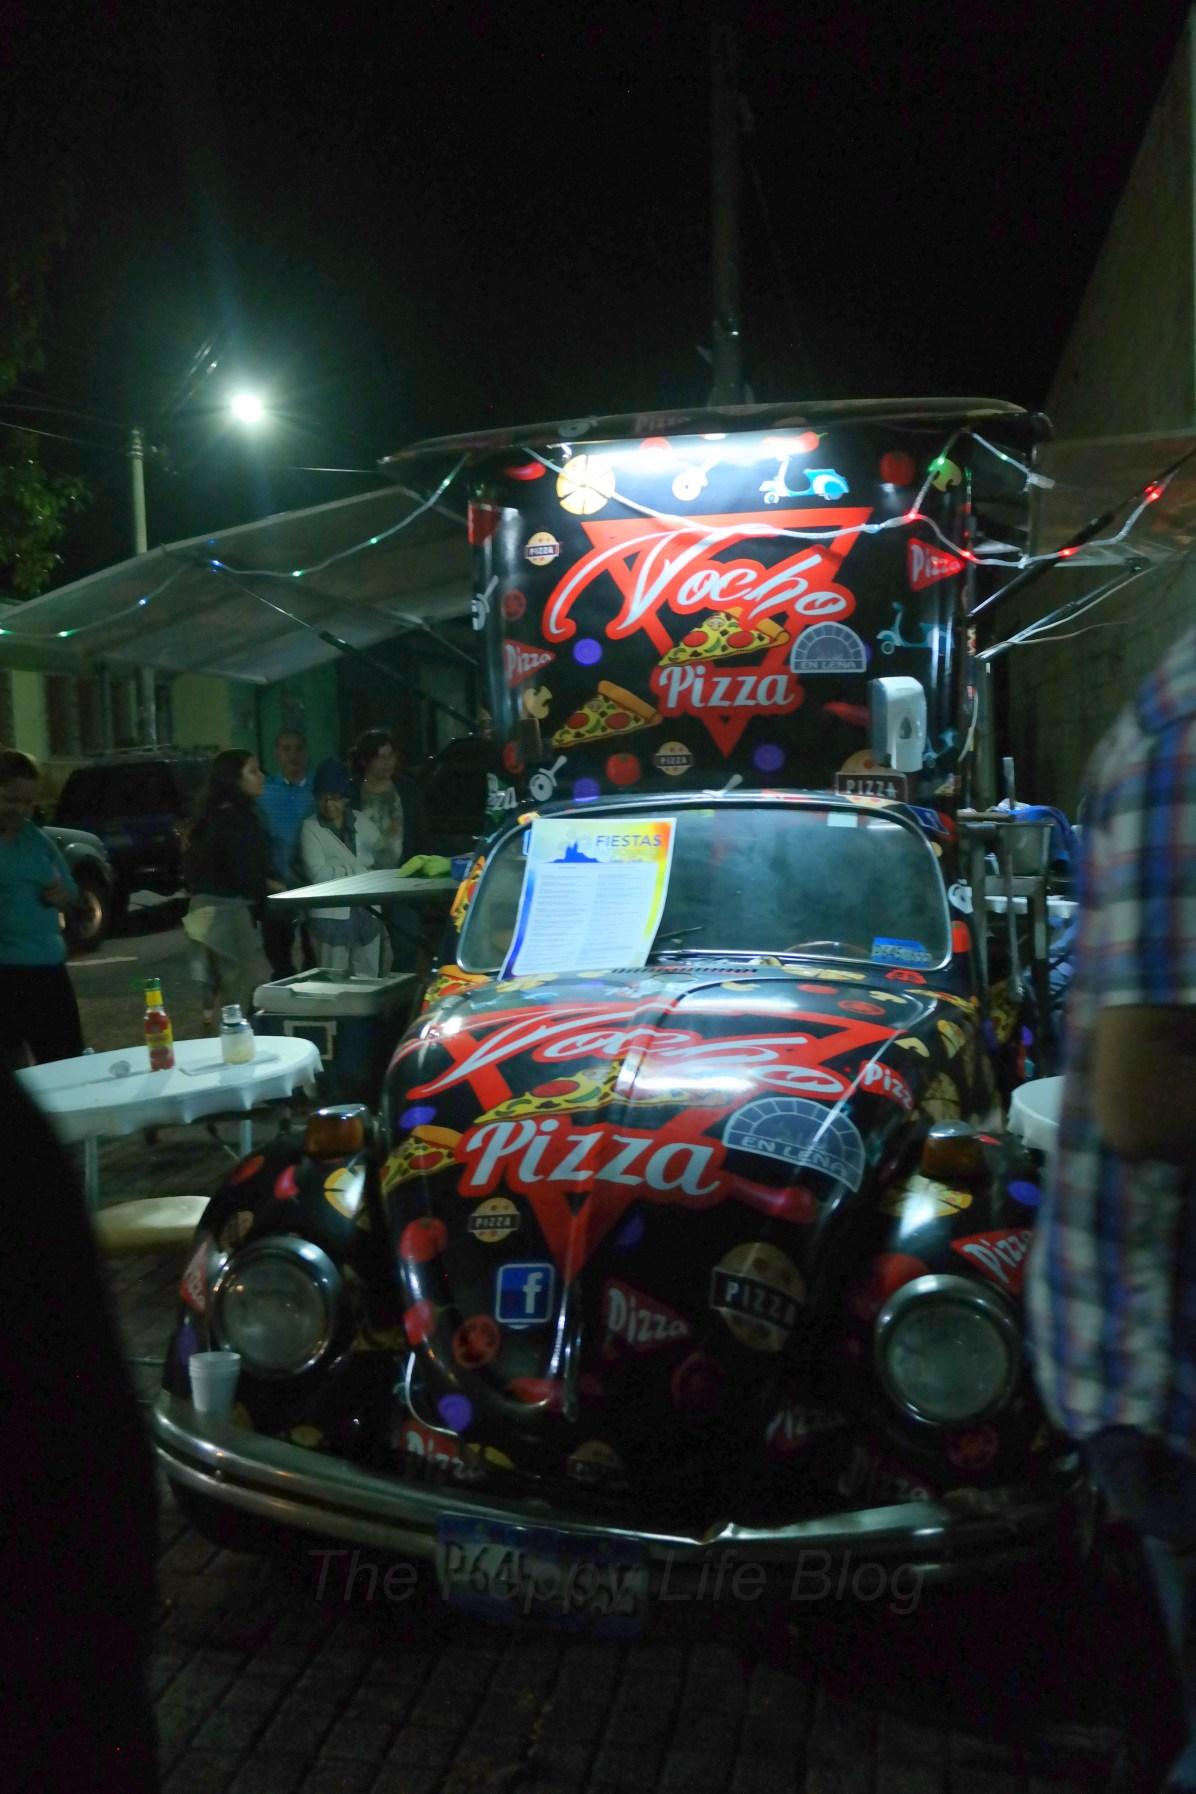 The mobile pizzeria!